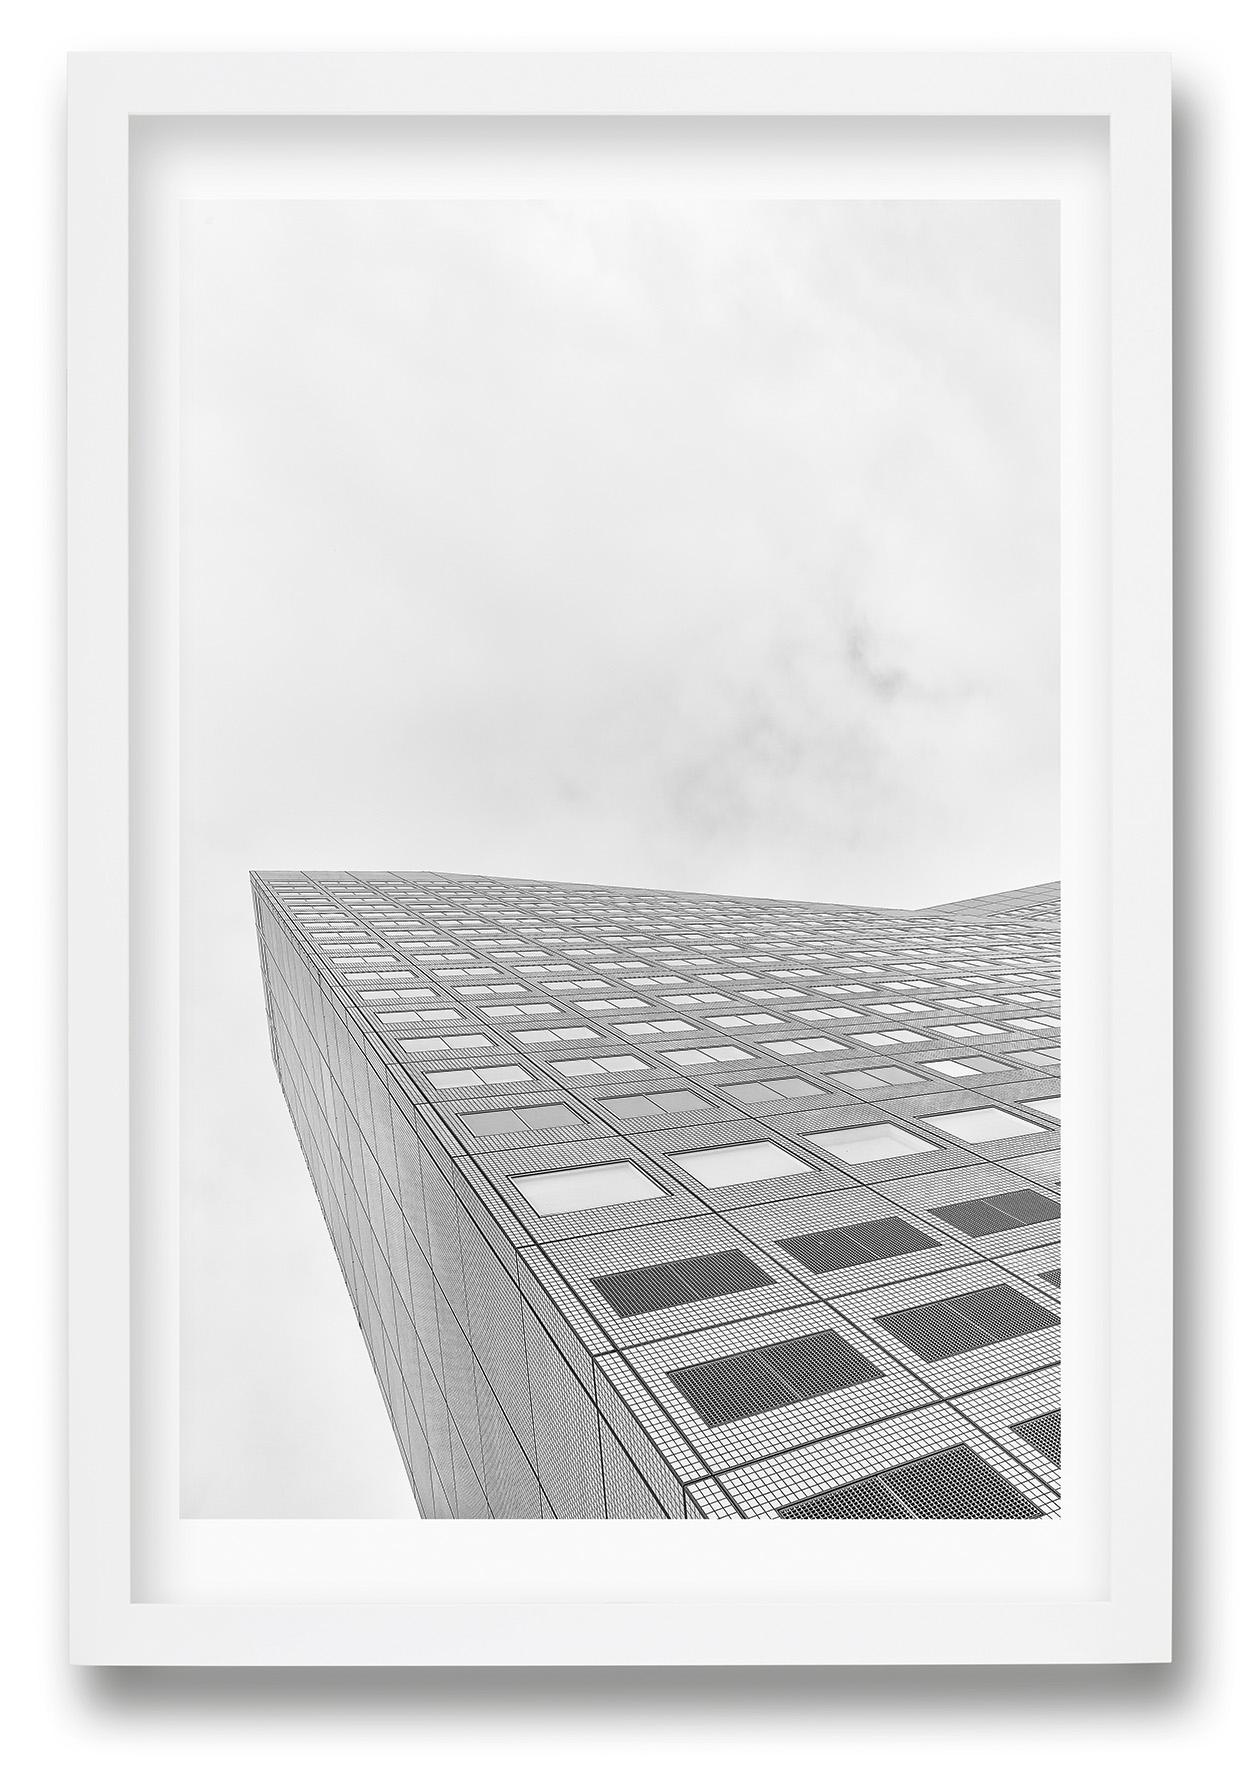 Rahmen_100x150_Hochformat_Rotterdam_9-11_2016_0955